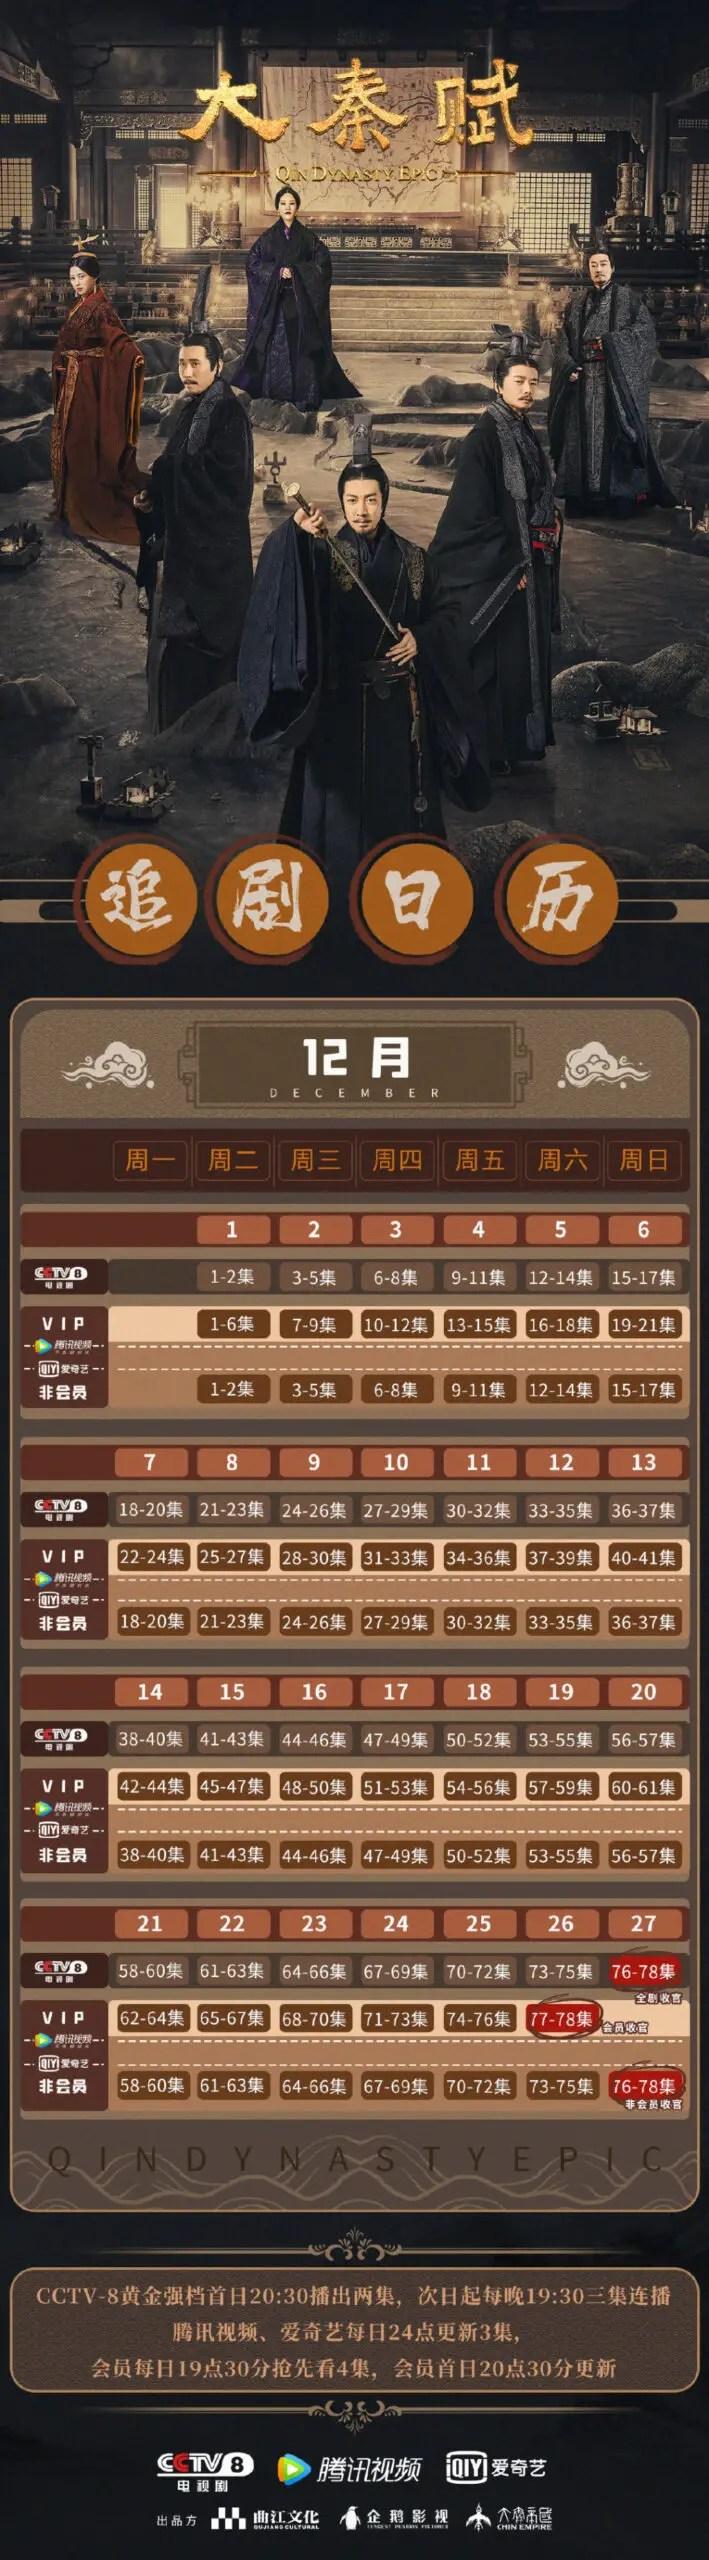 Qin Dynasty Epic Chinese Drama Airing Calendar